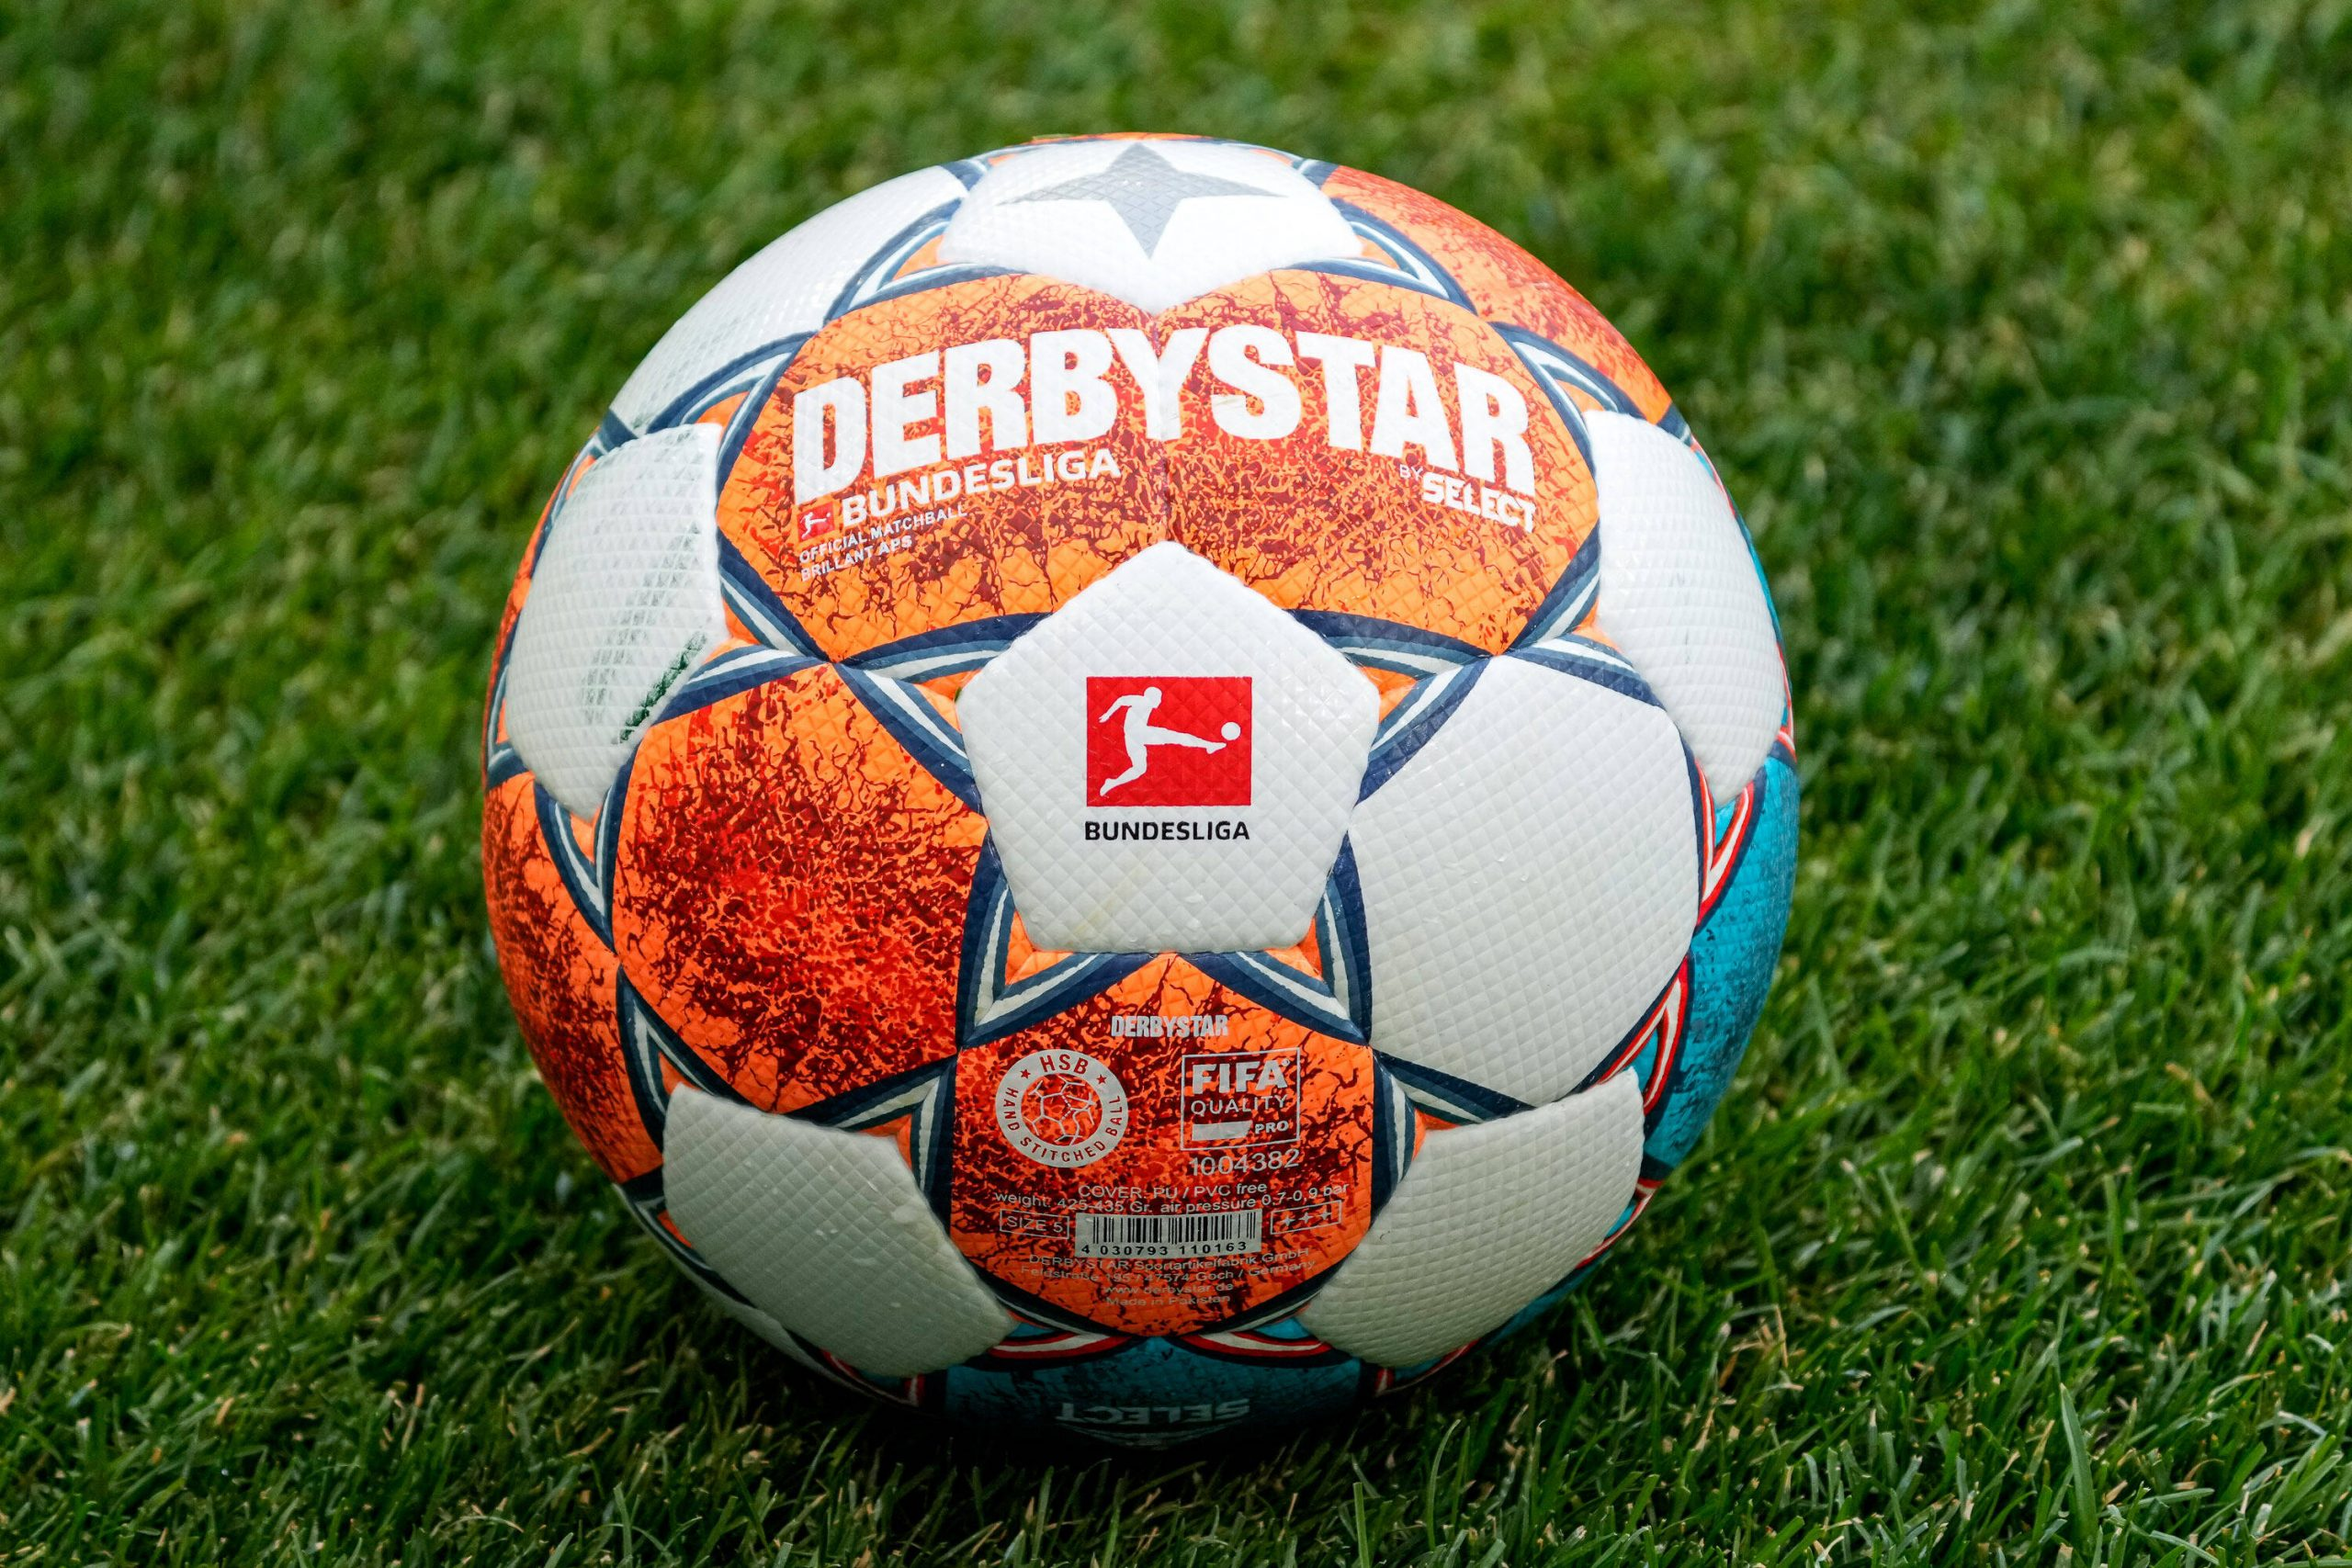 Bundesliga agrees four-season TV deal with Sky Sports UK